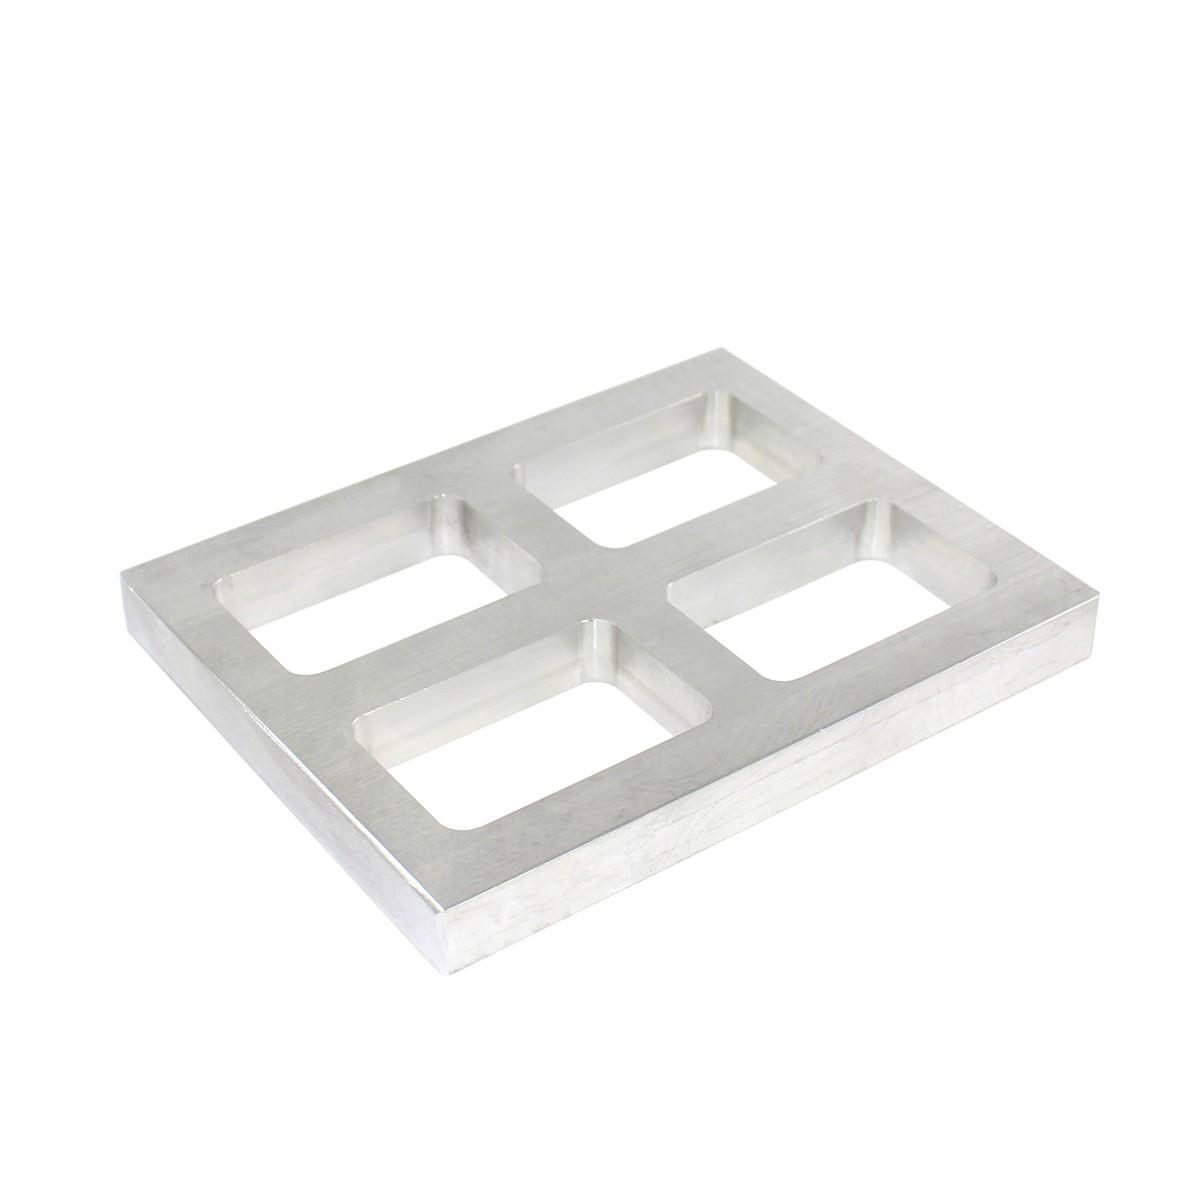 "Aluminum Quad Mold Frame - 3/4"" x 1-7/8"" x 2-7/8"""